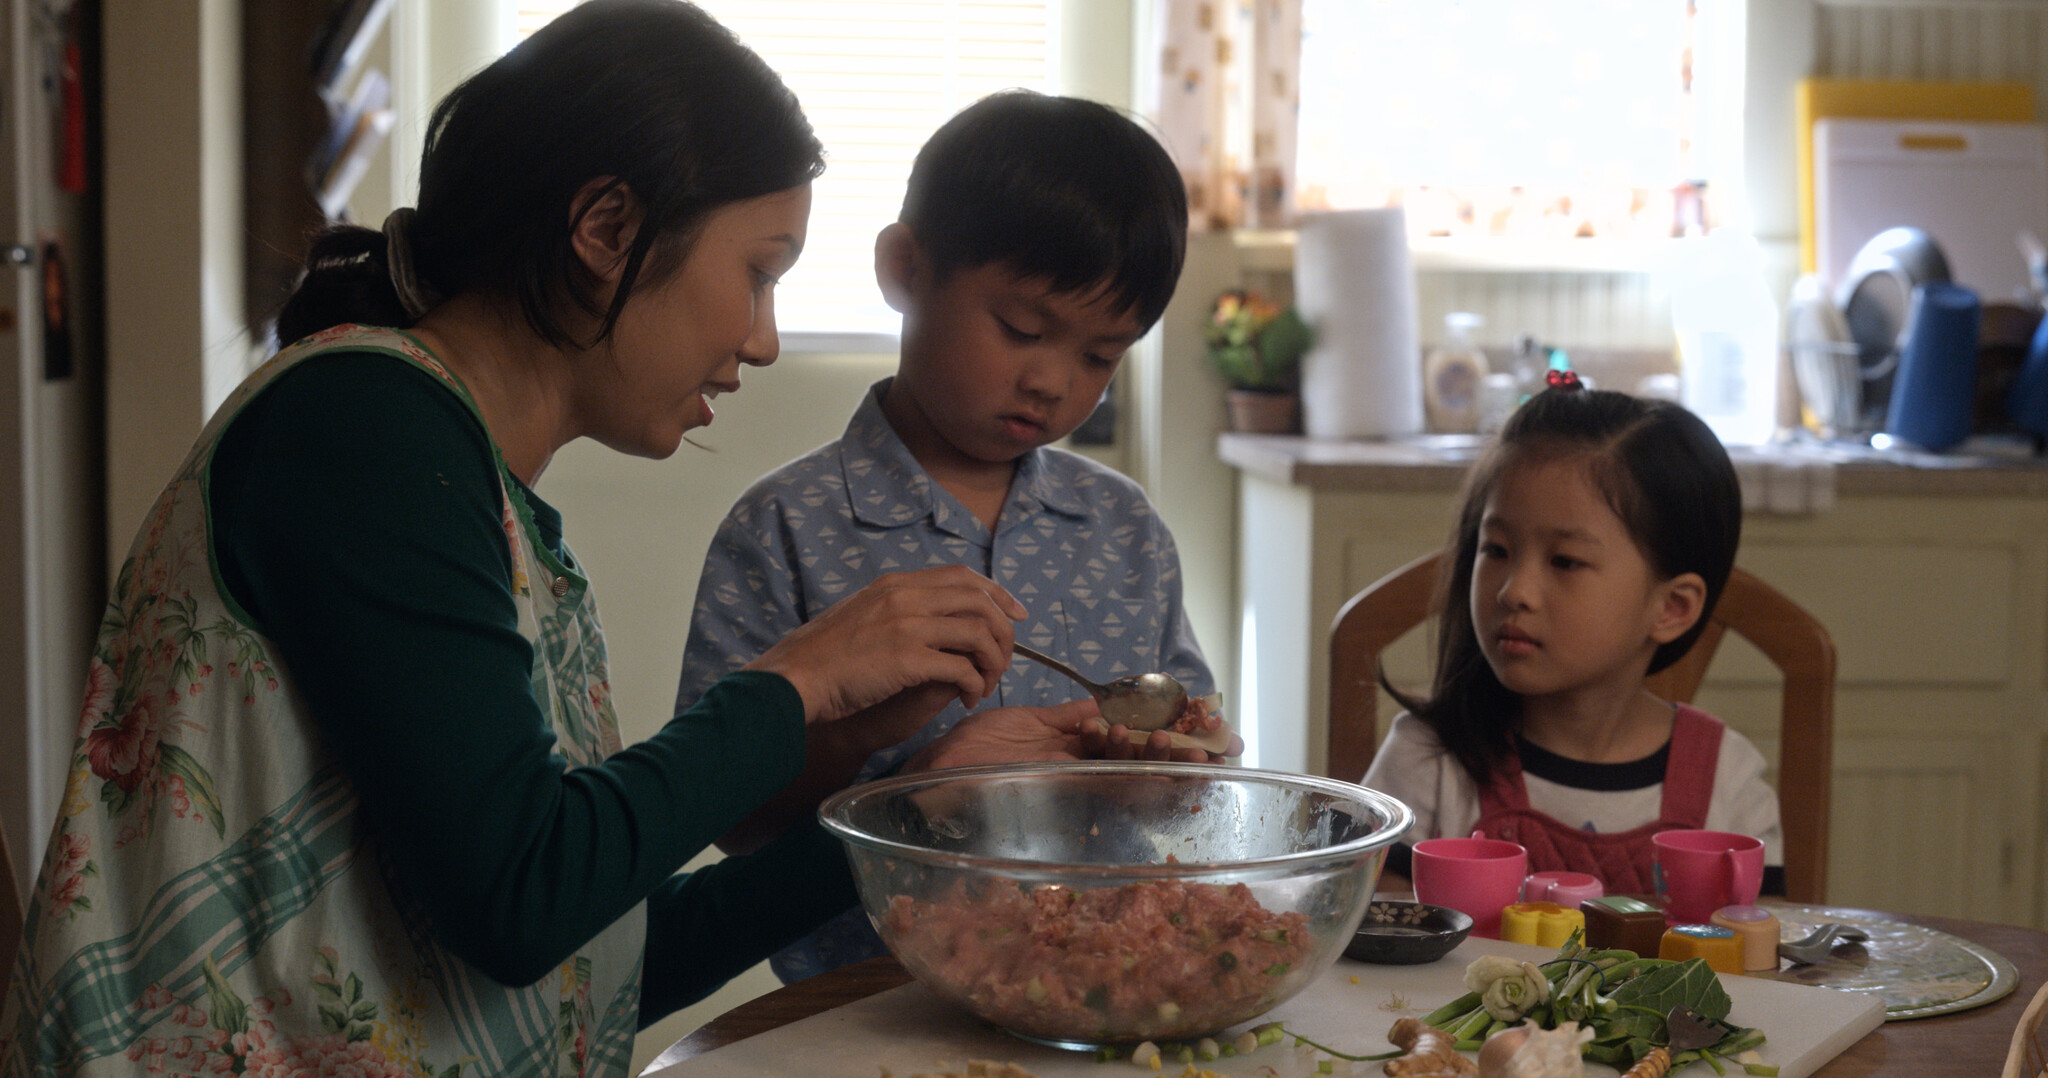 Kumail Nanjiani and Emily V. Gordon's 'Little America' Renewed for Season 2 on Apple TV+